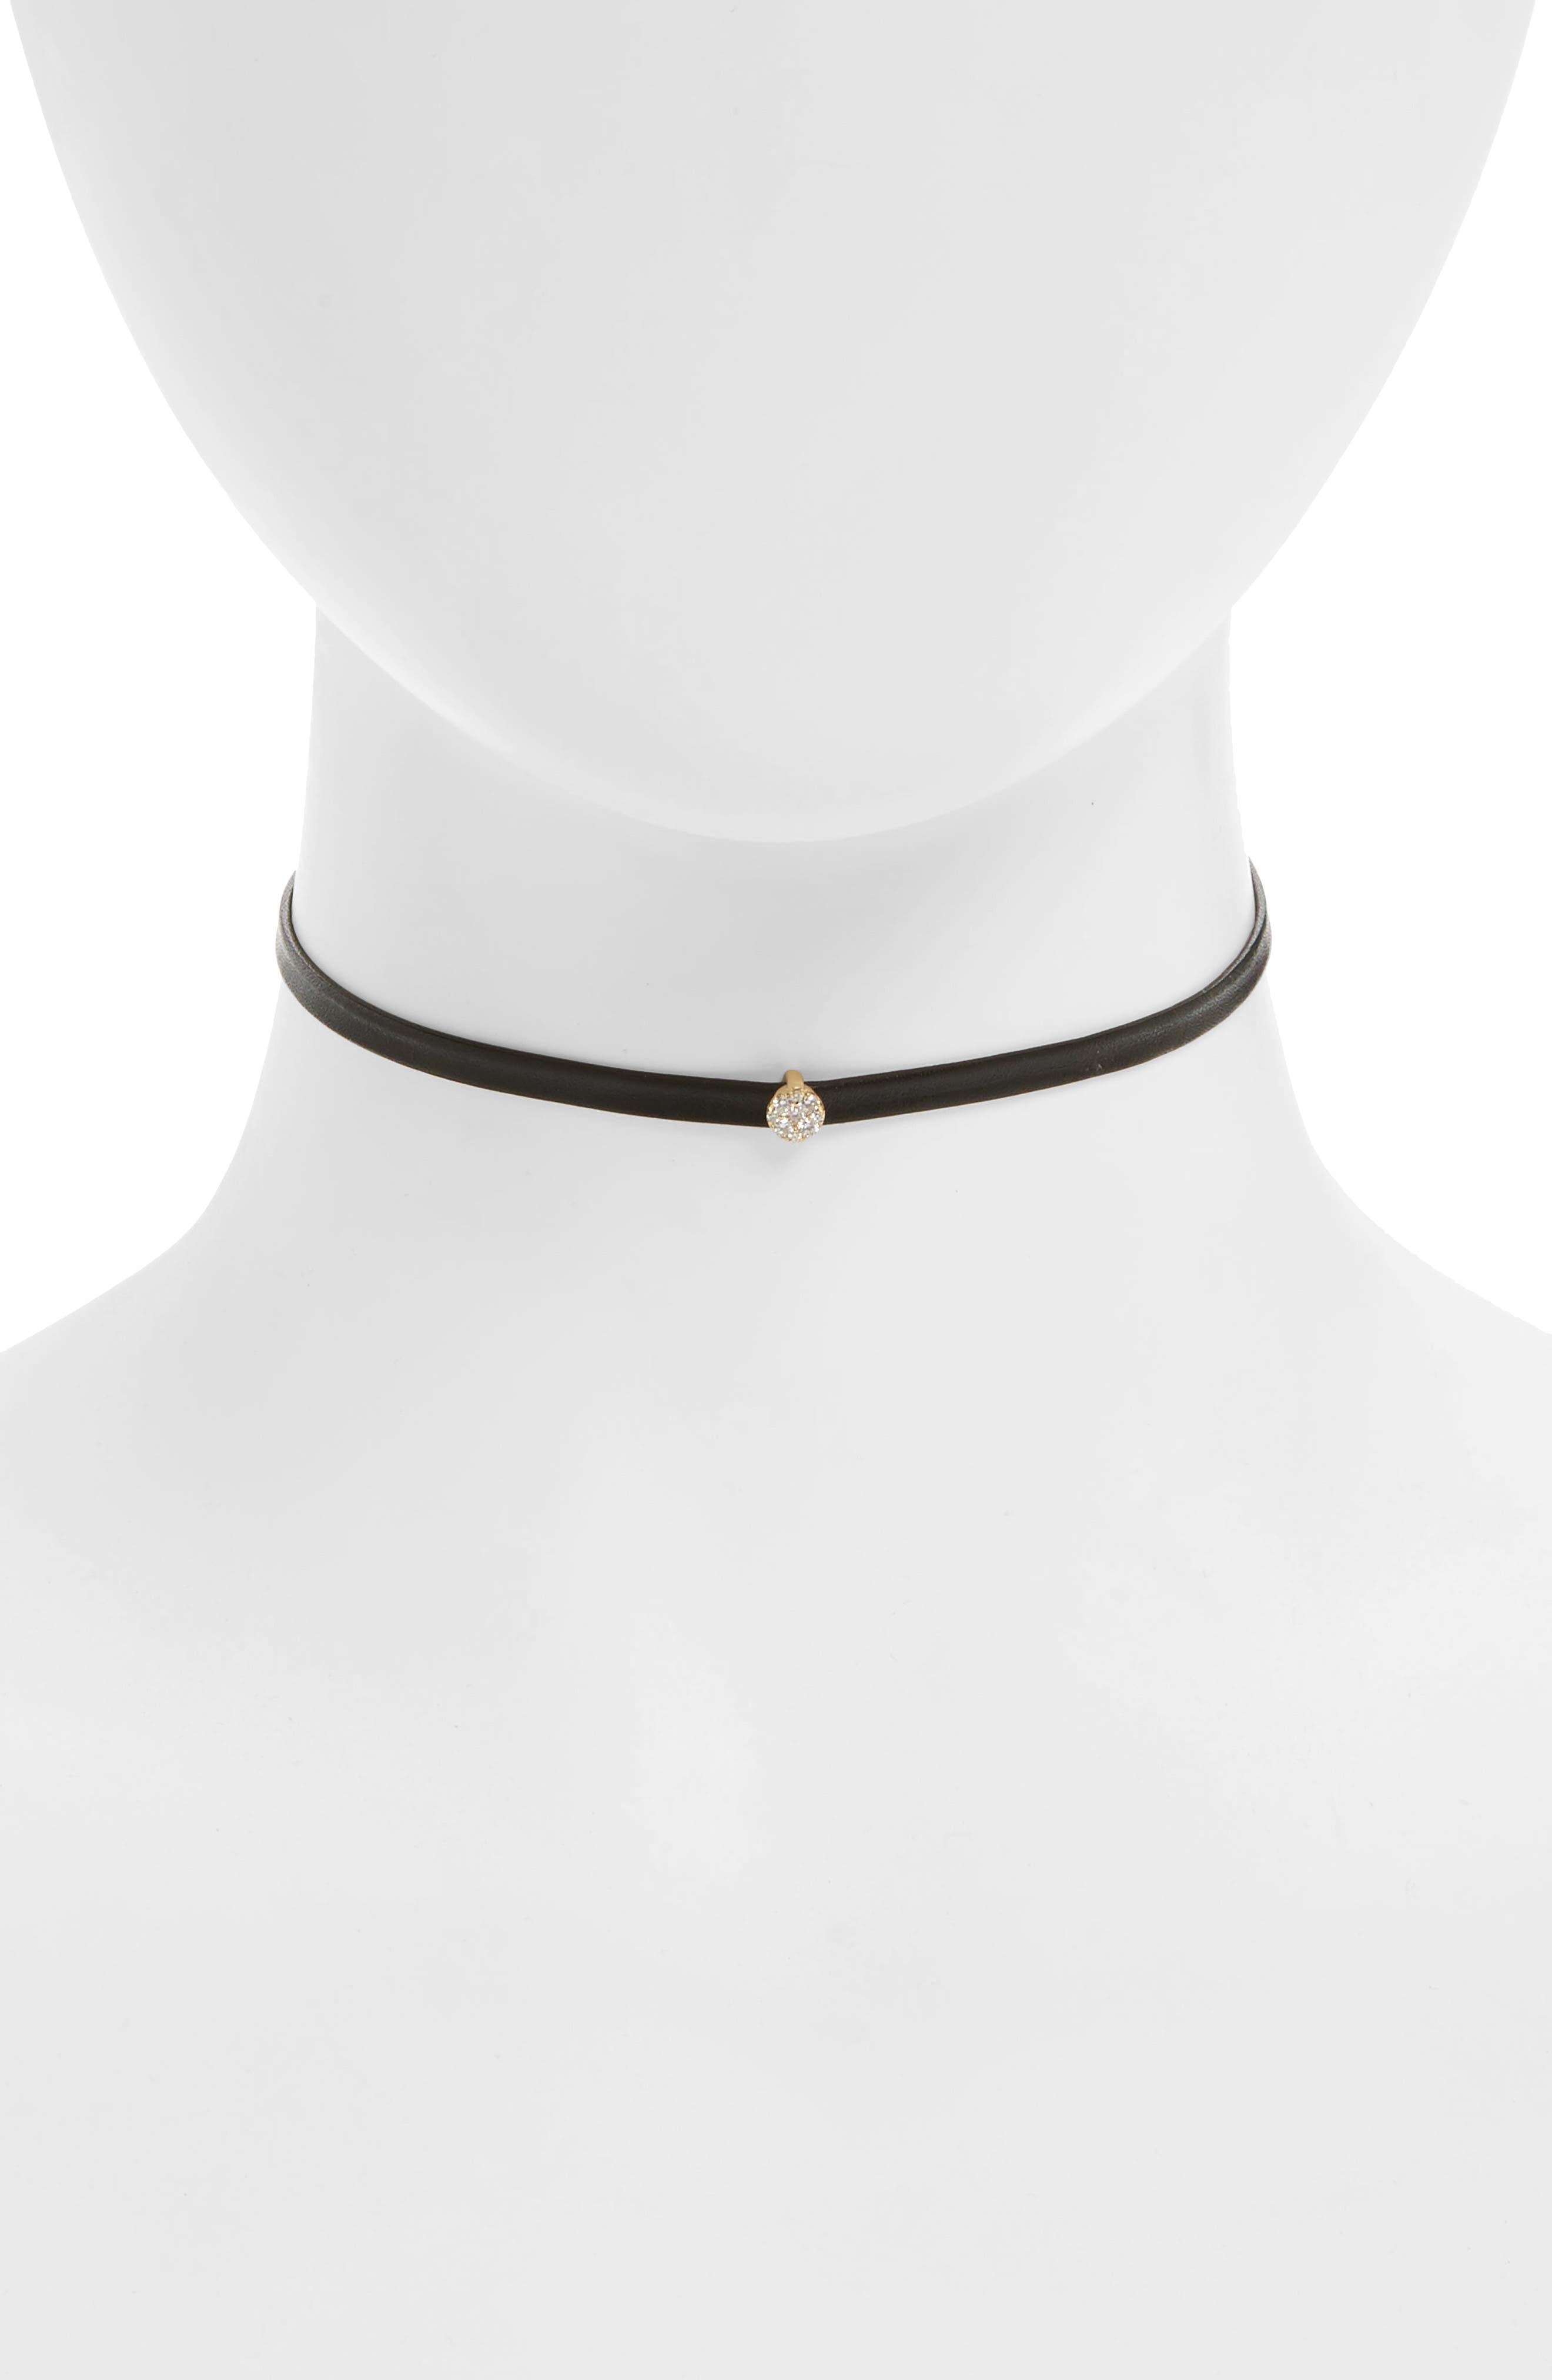 Main Image - EF COLLECTION Diamond Leather Choker